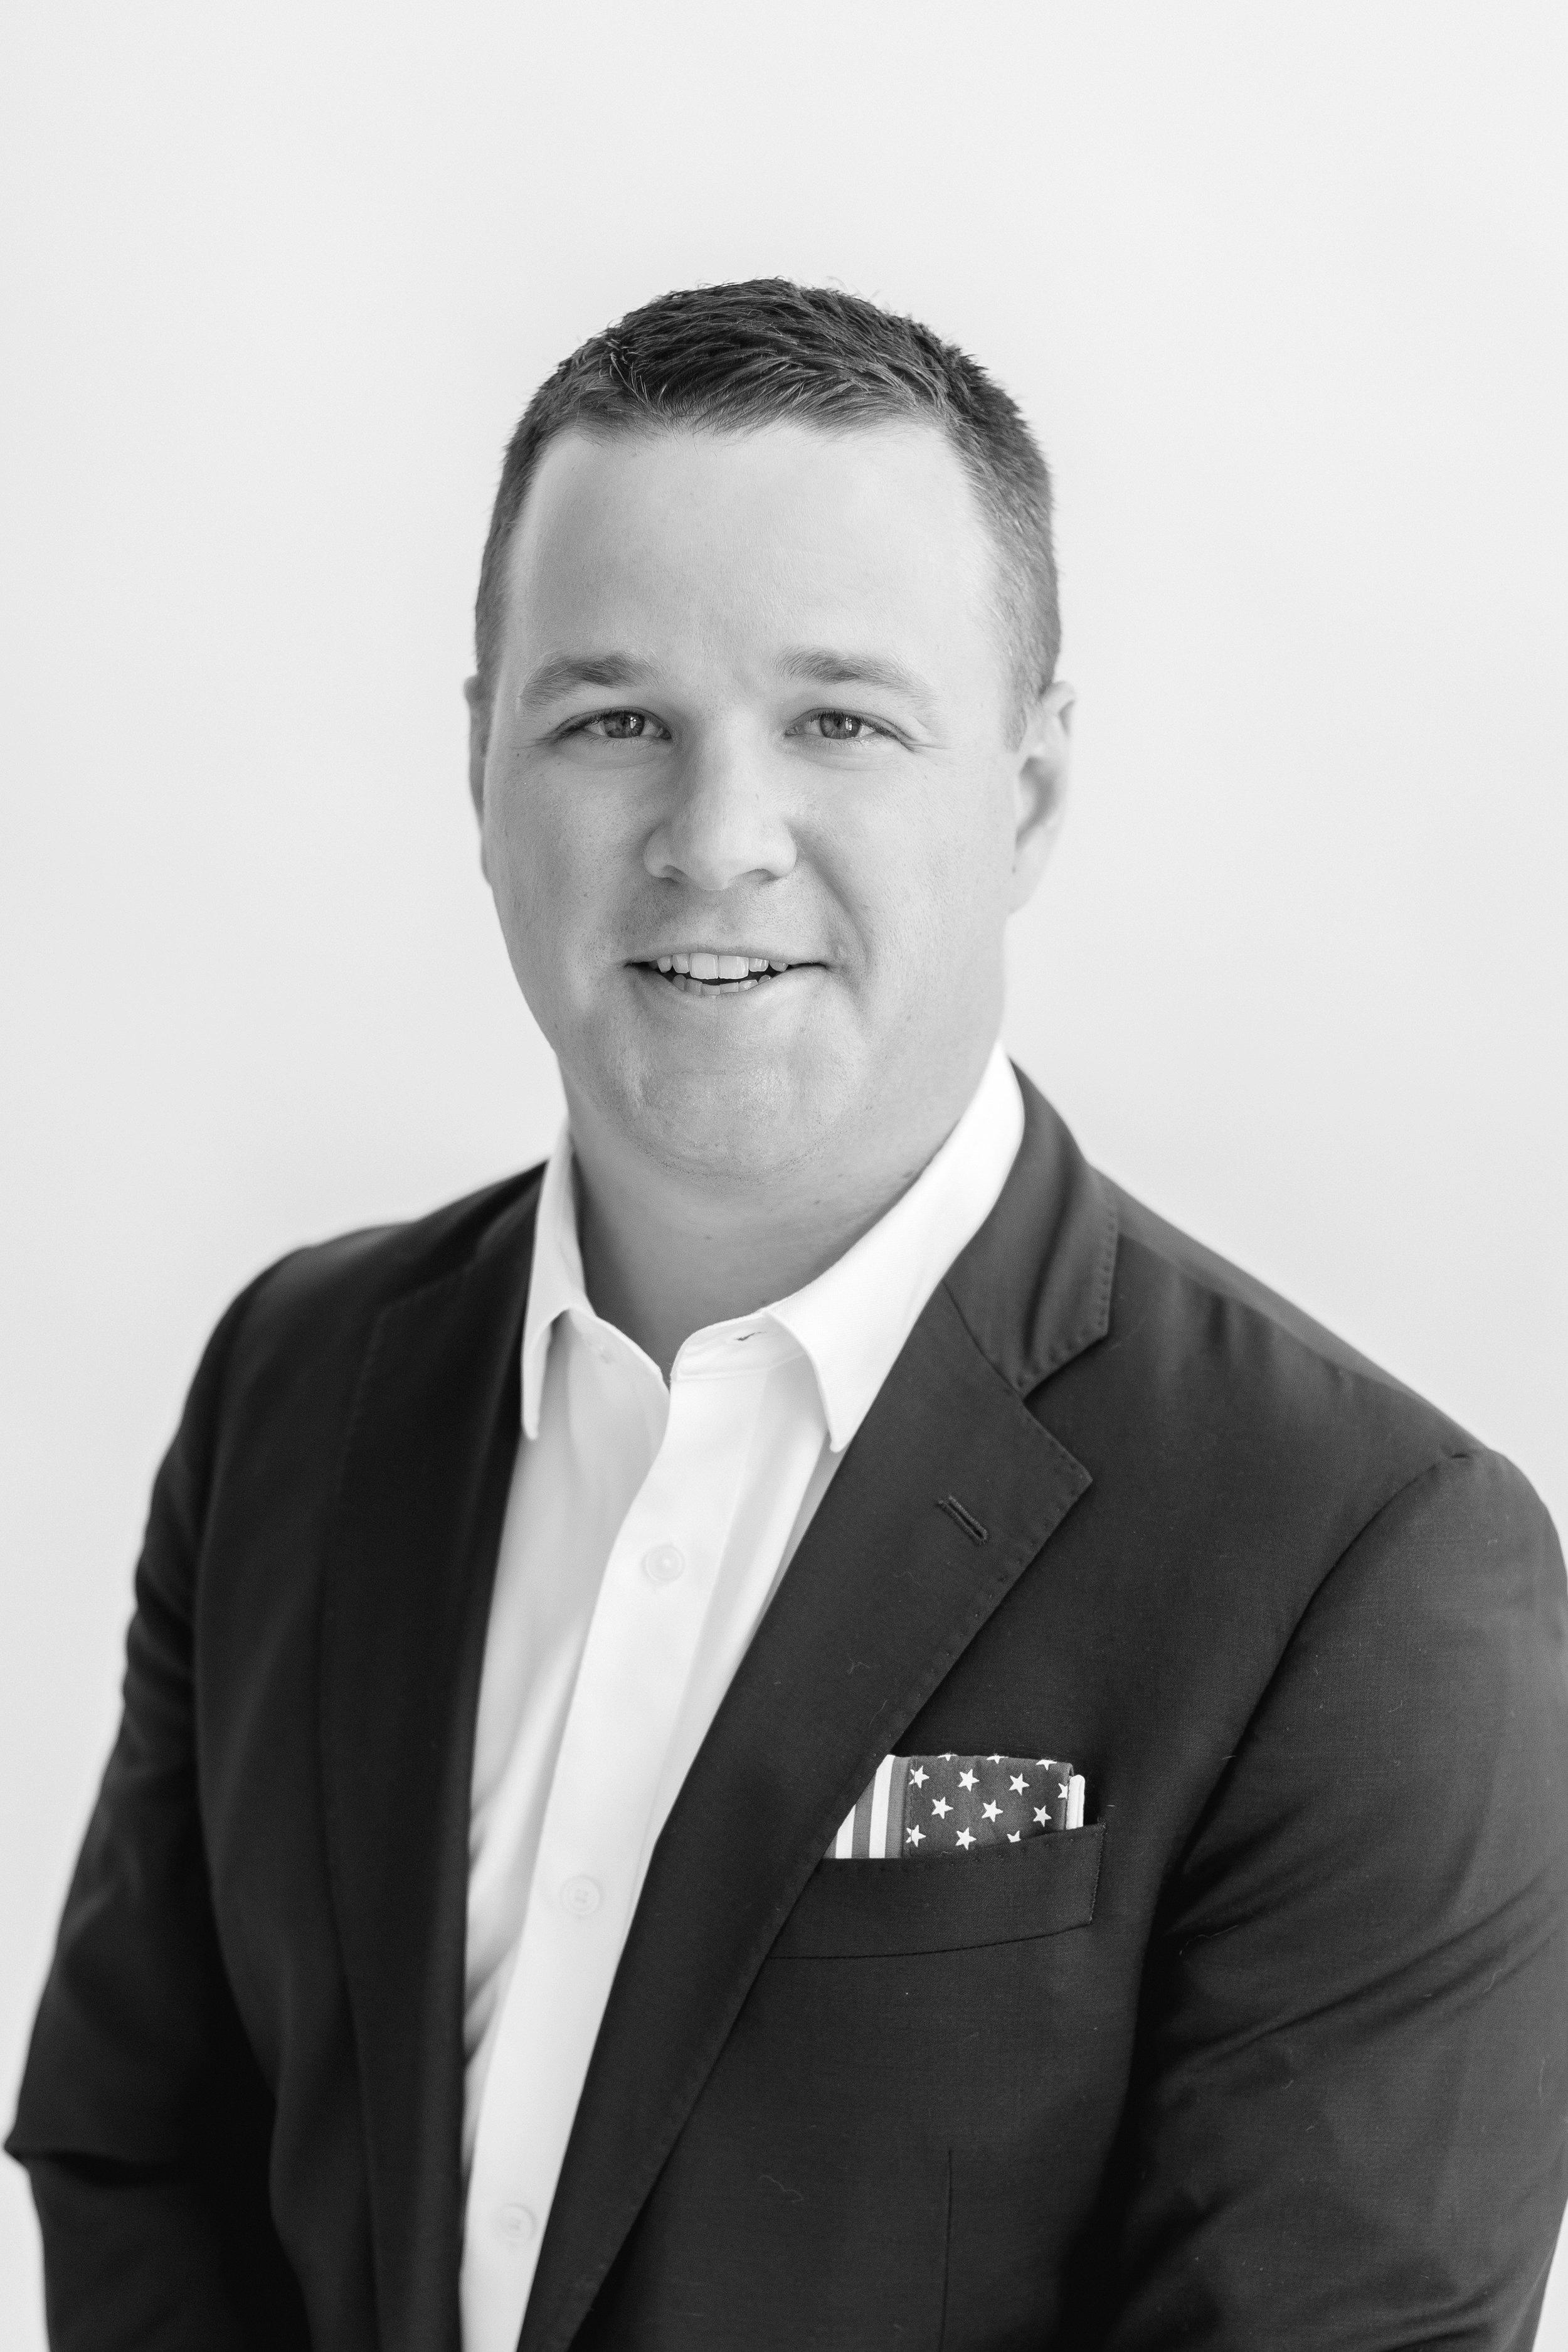 SHAWN REGAN | Managing Director - Operations